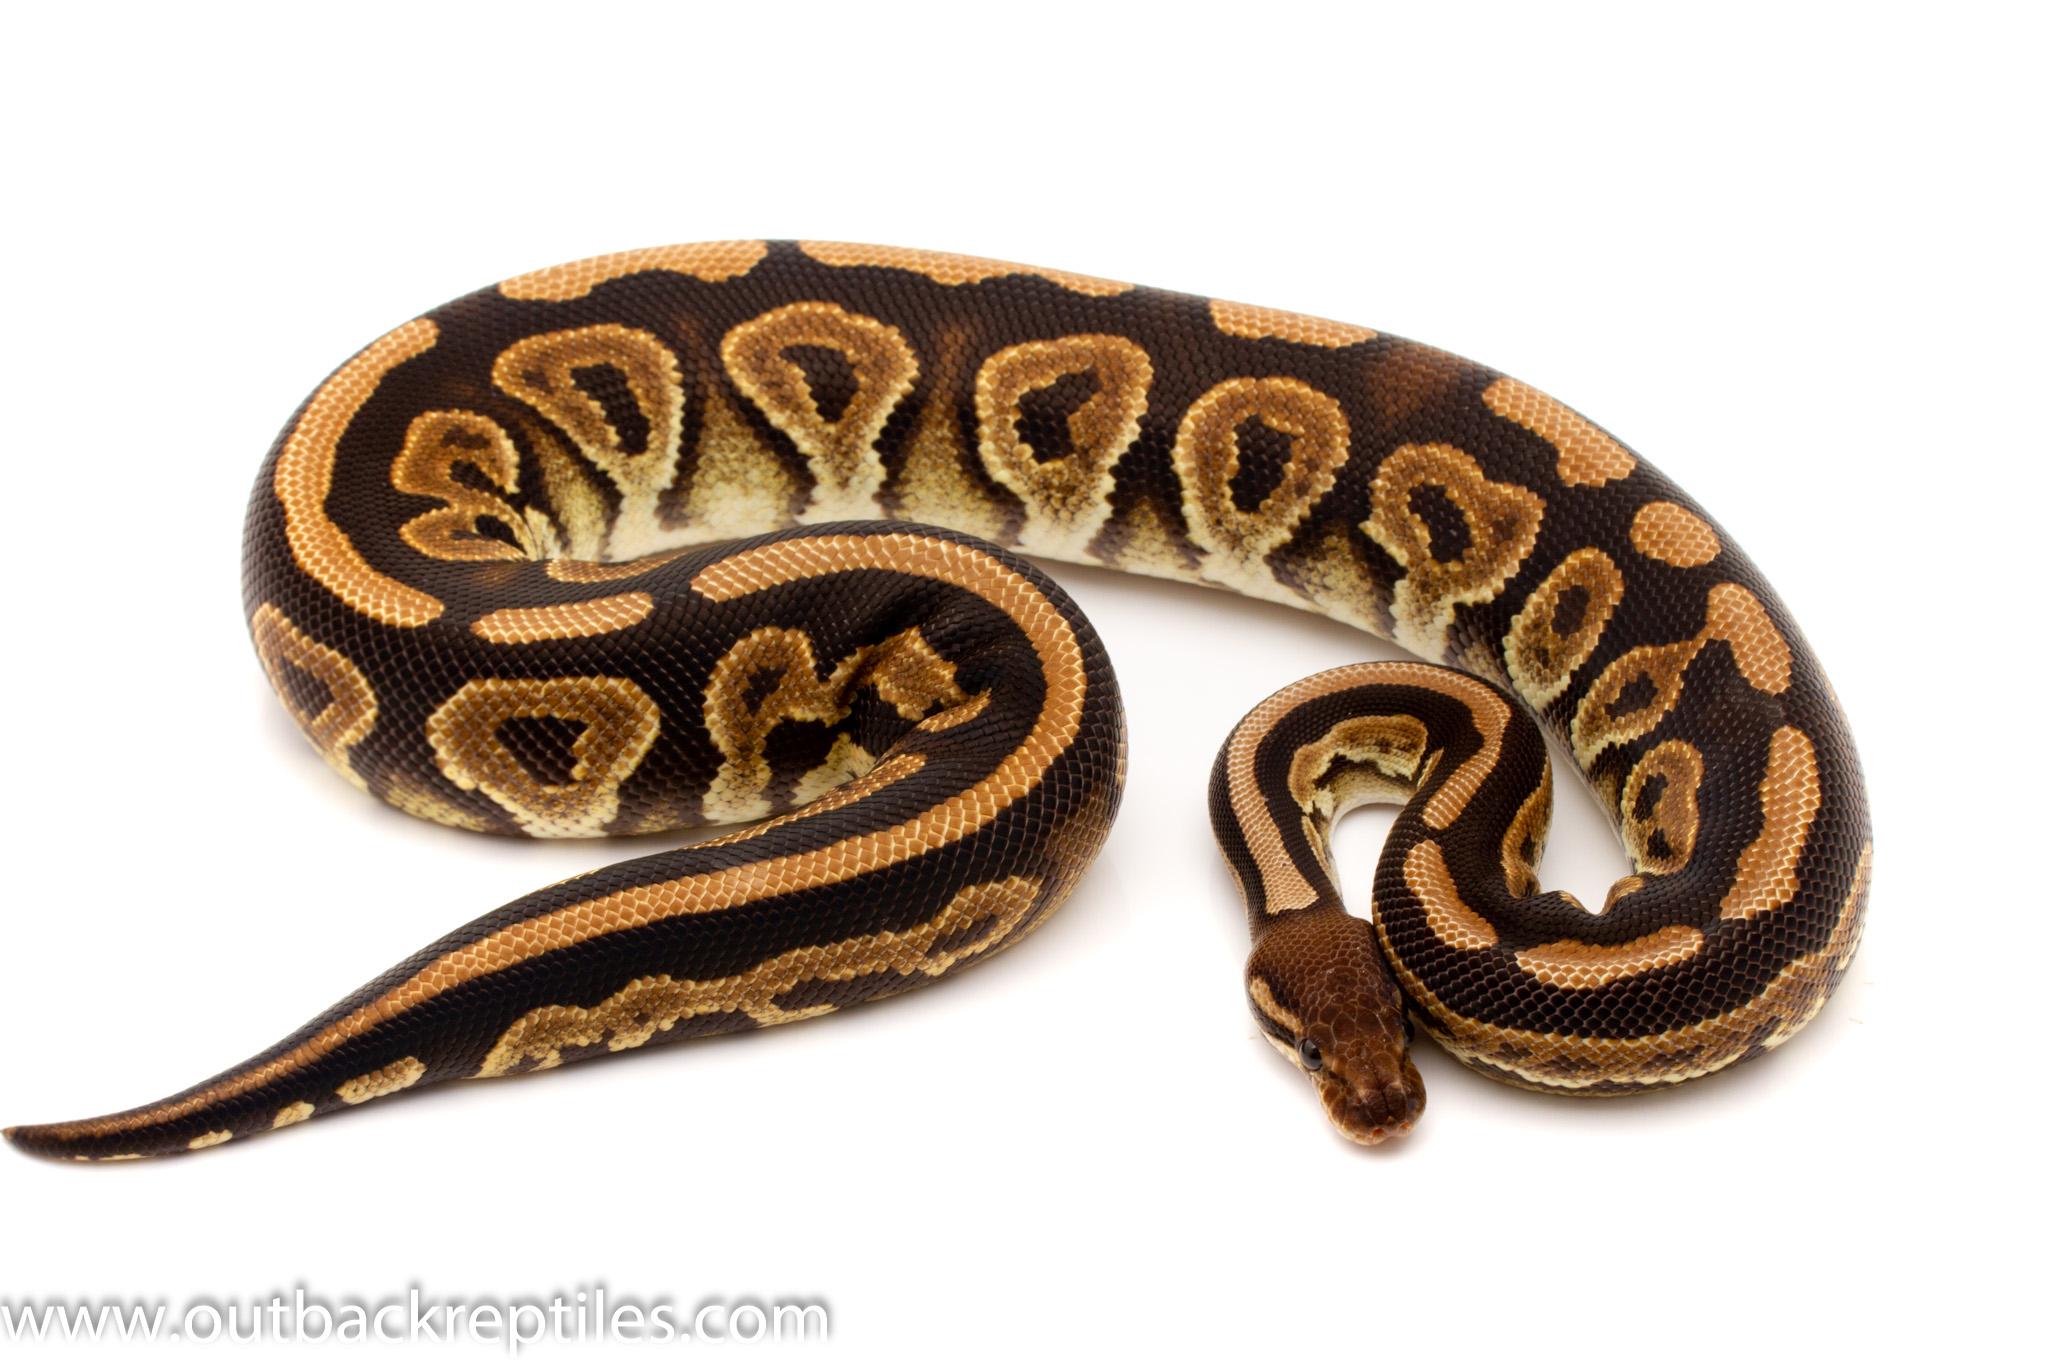 Black Pastel ball python for sale